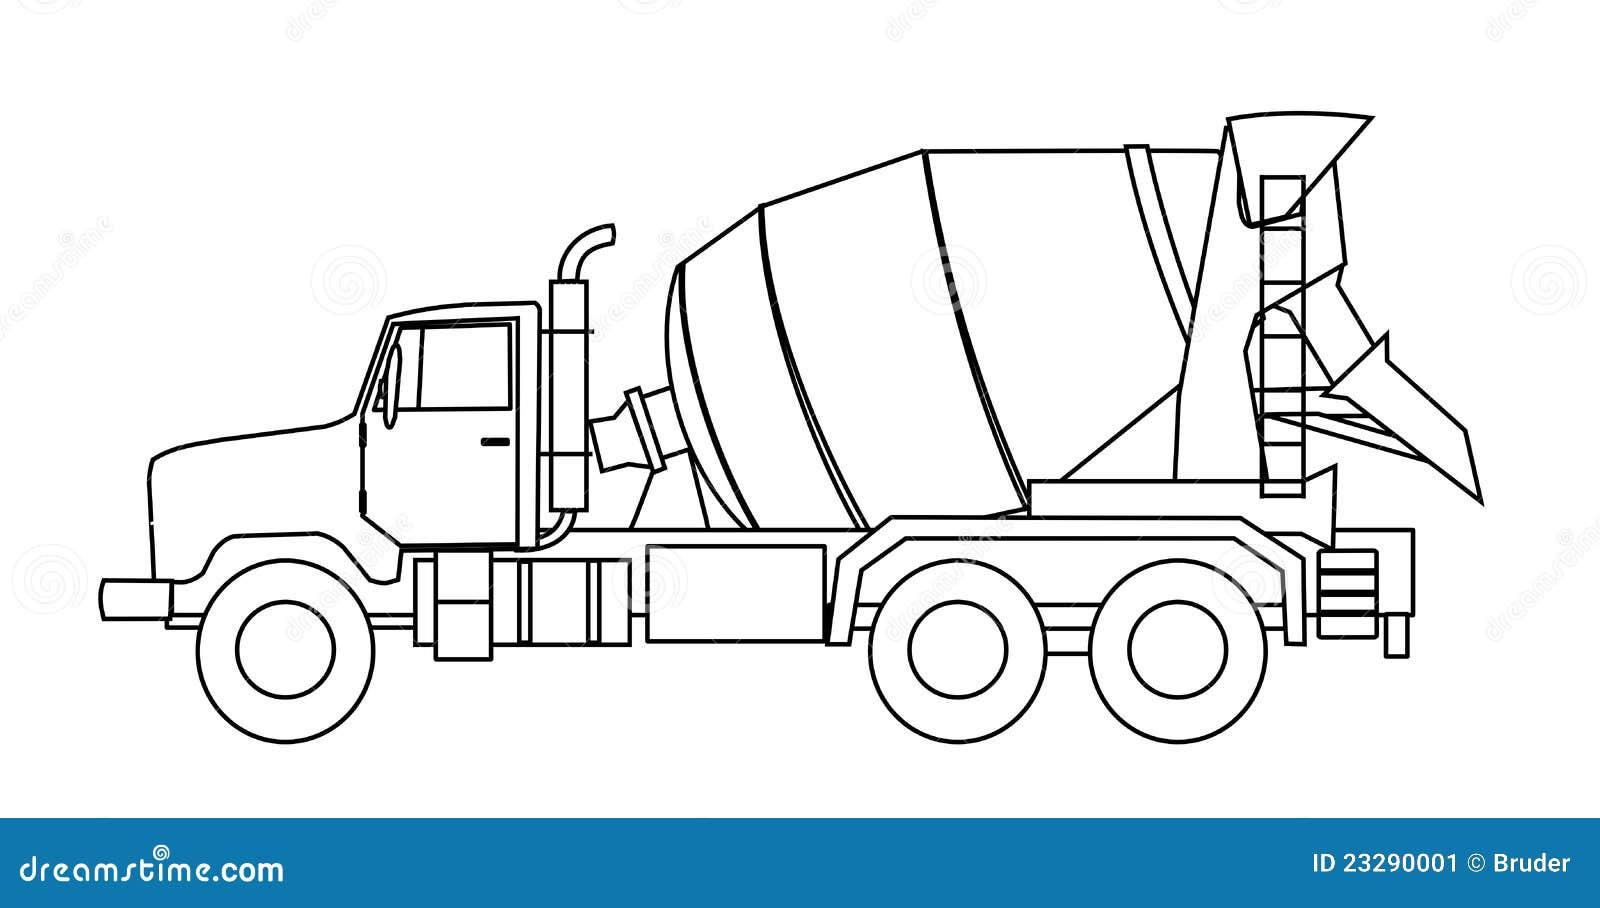 Cement Mixer Truck Stock Vector Illustration Of Contractor